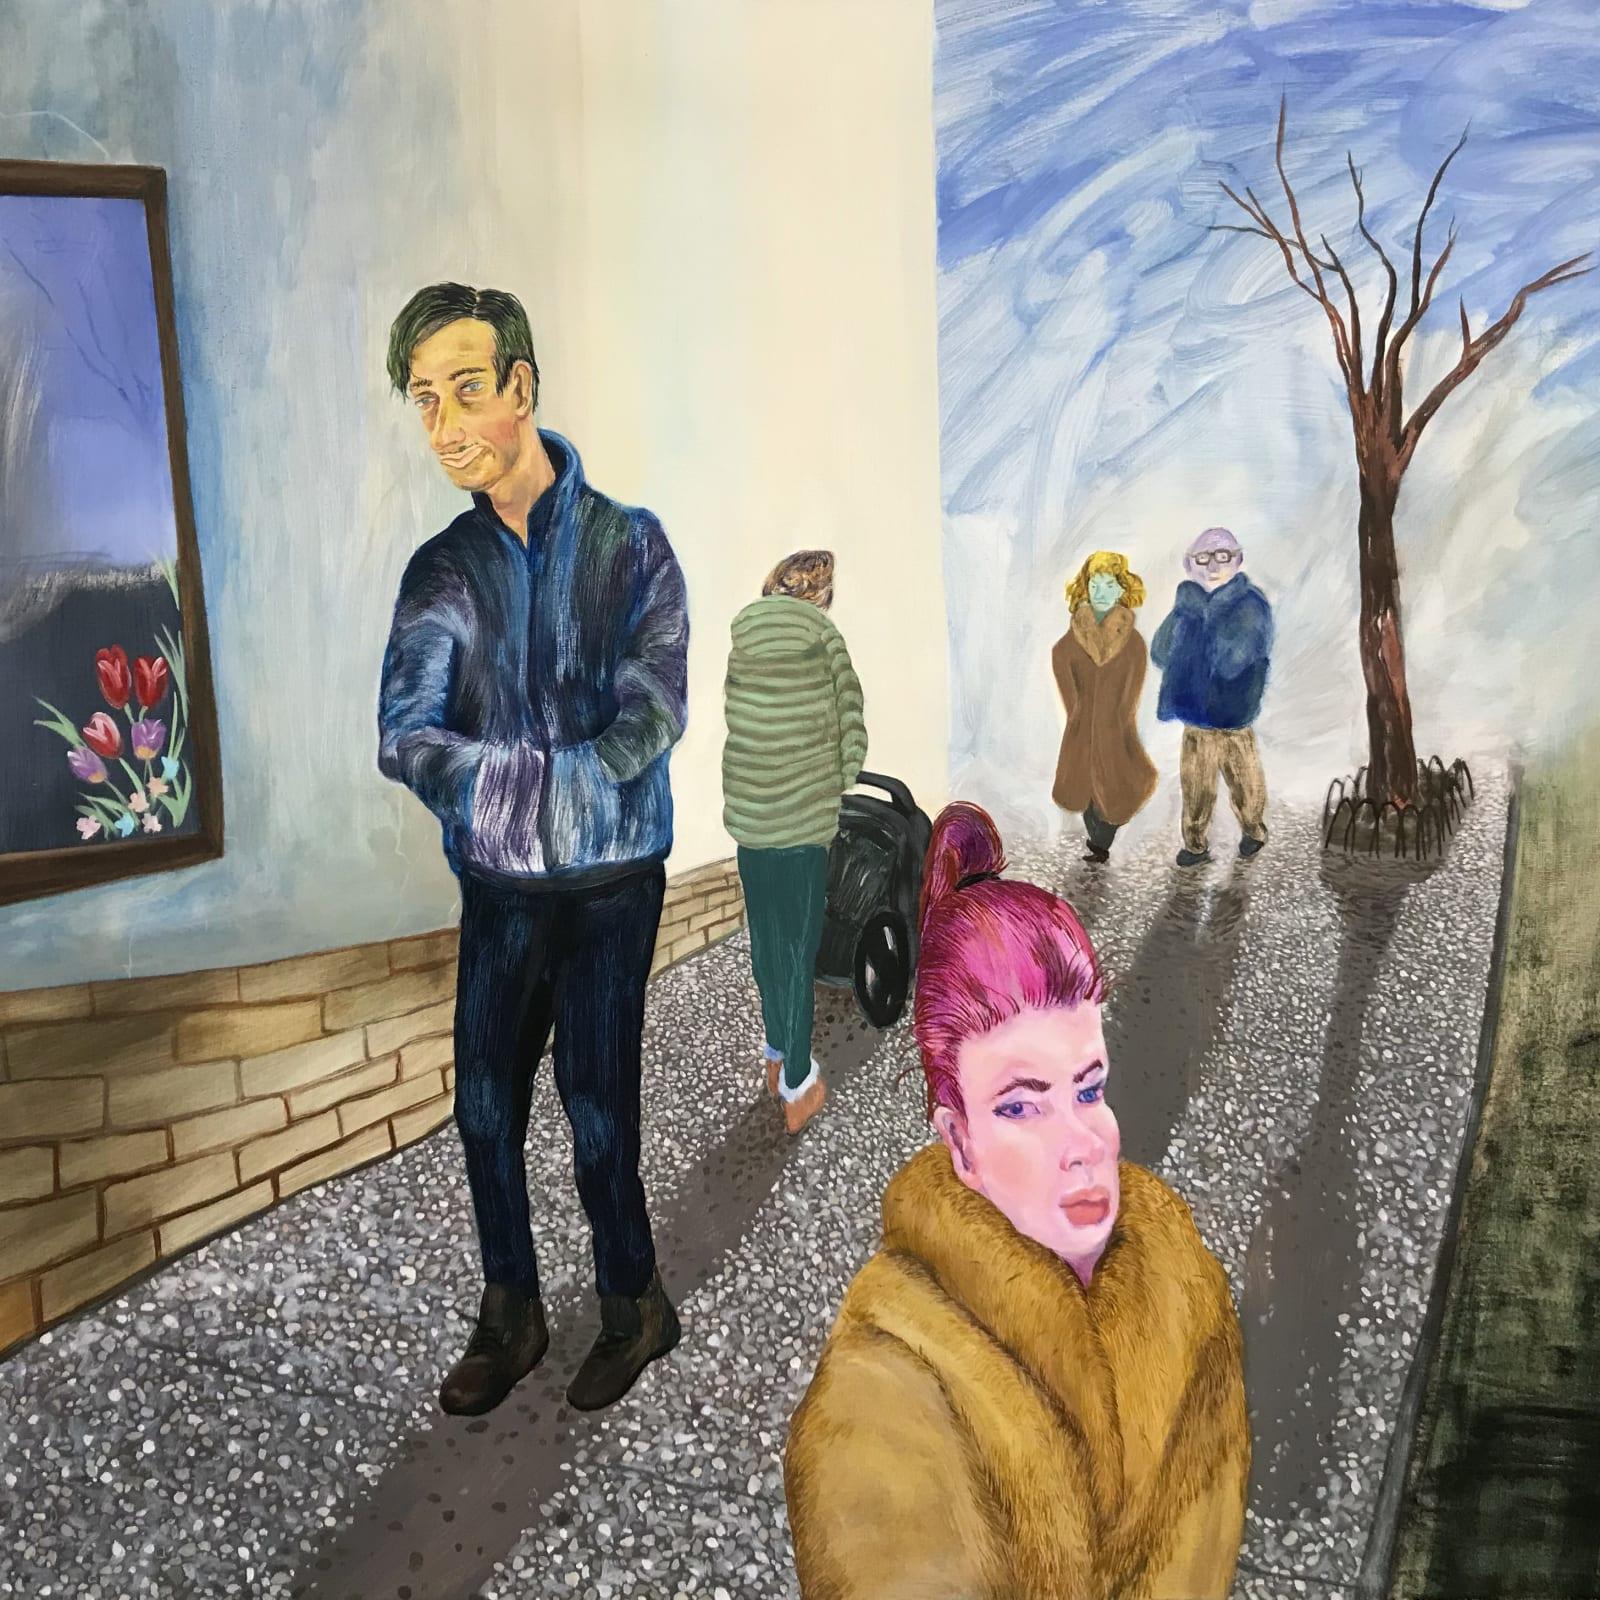 Maggie Ellis  Cold Sunset, 2020  Oil on linen  41 x 54 in (104.1 x 137.2 cm)